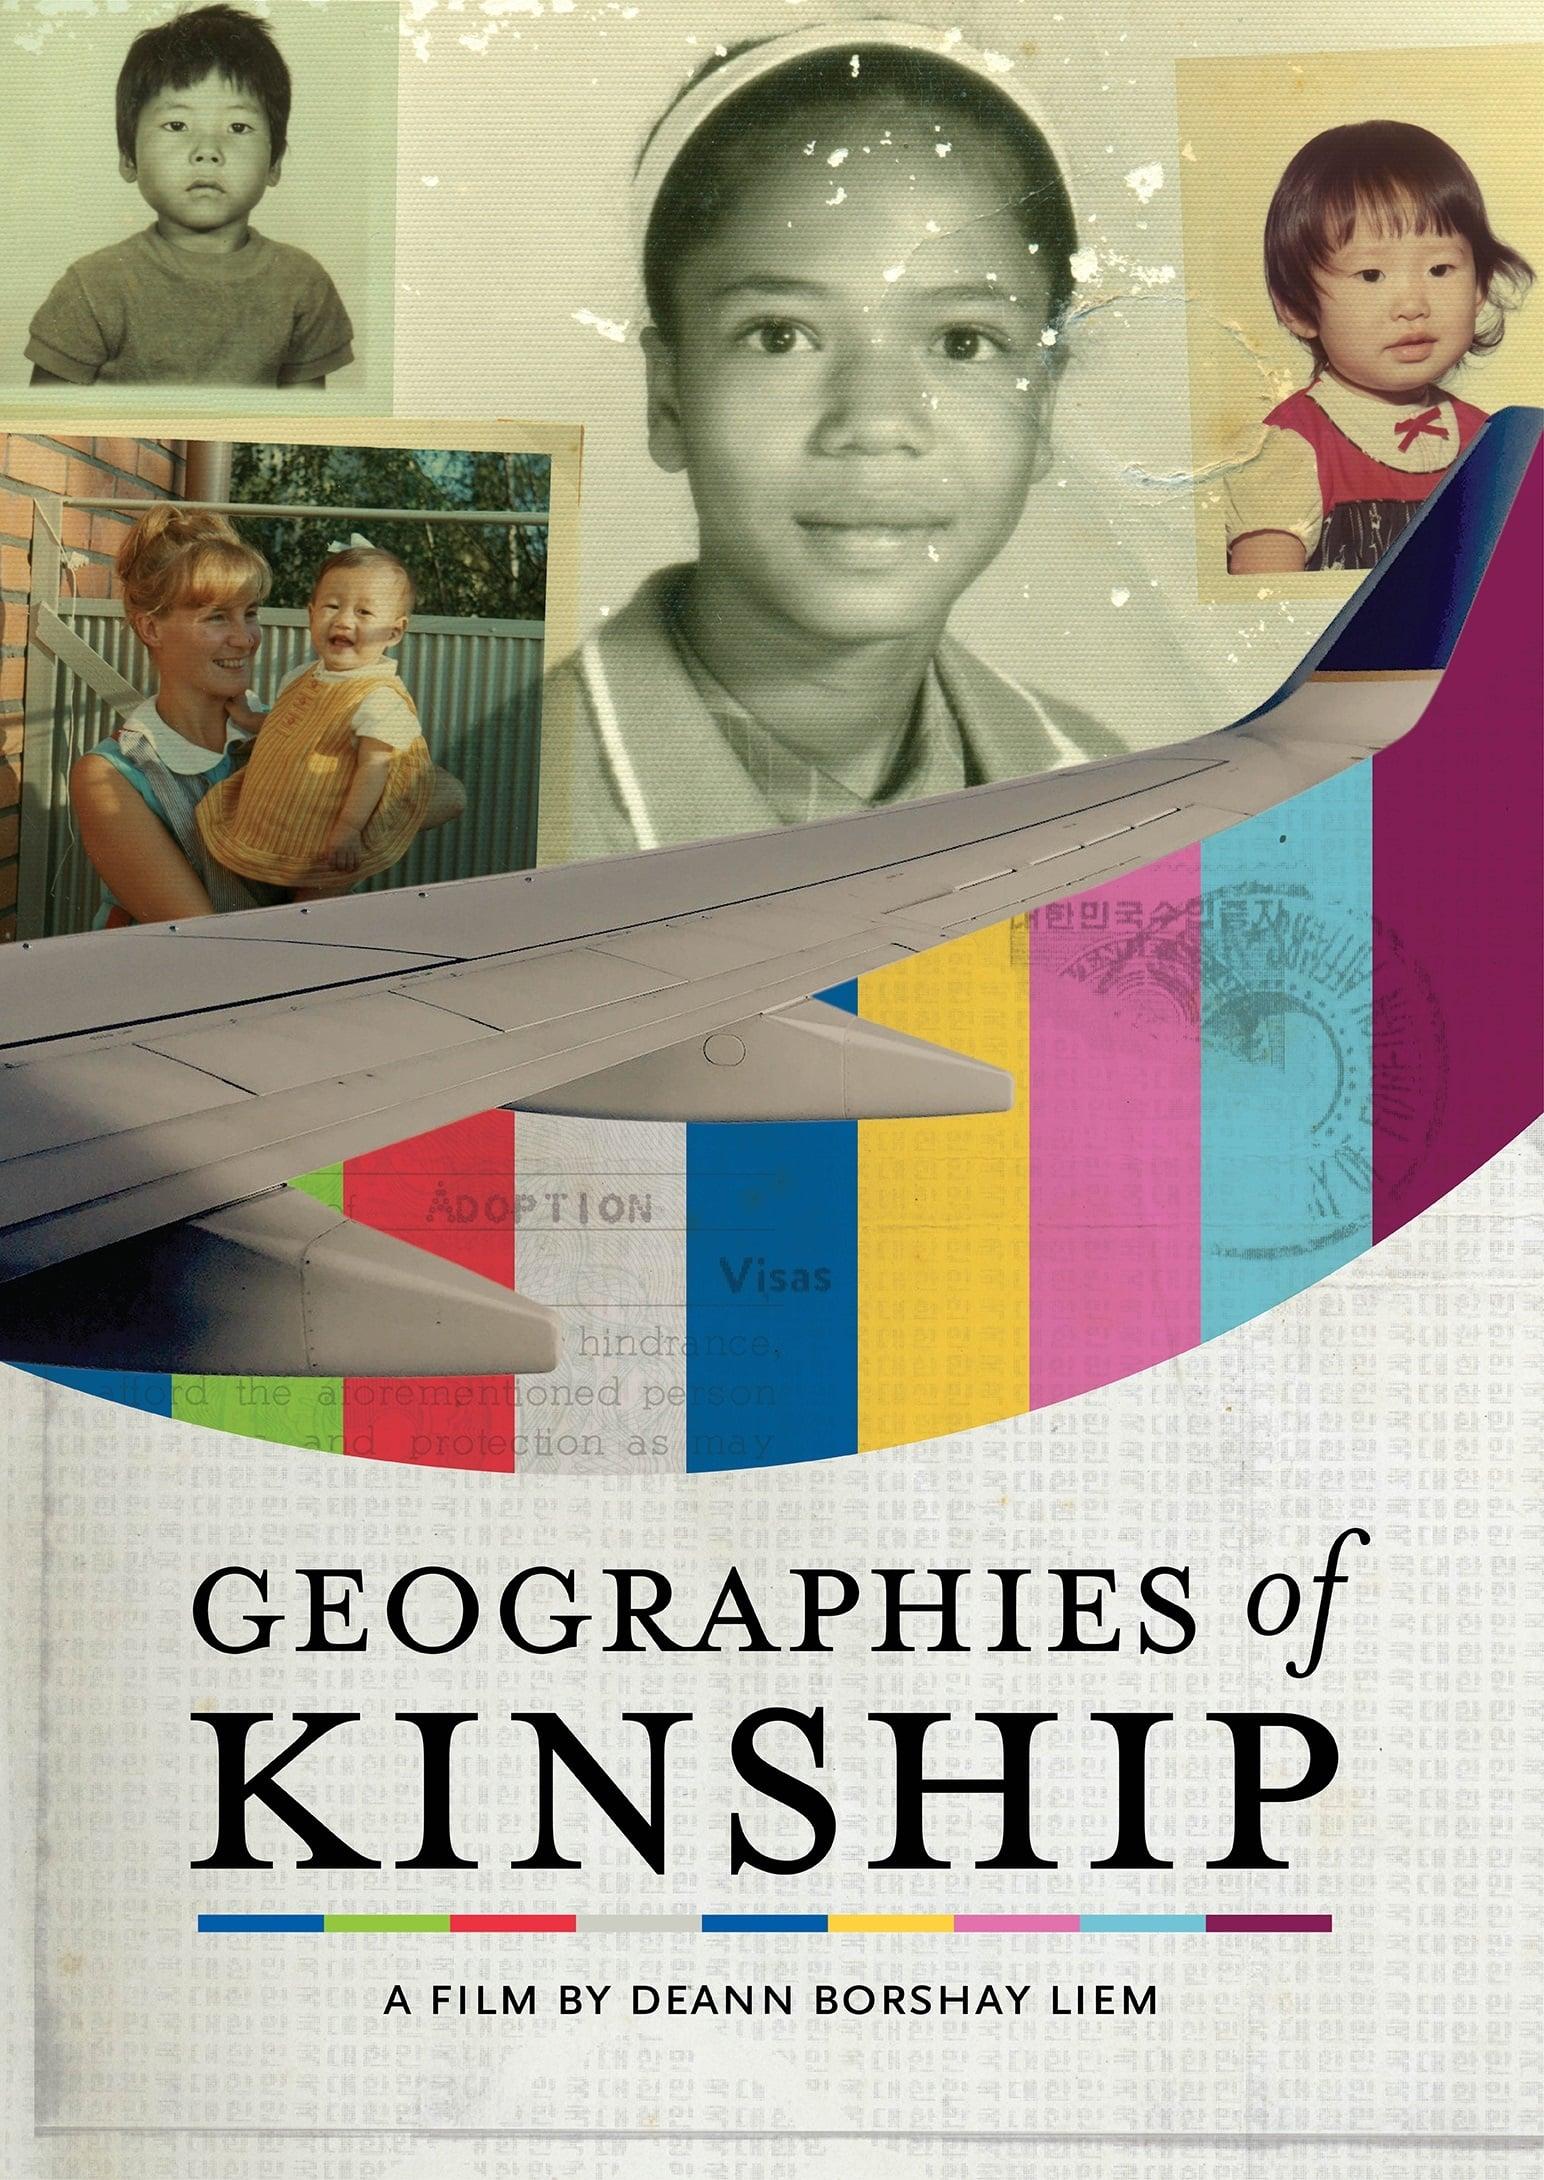 Geographies of Kinship